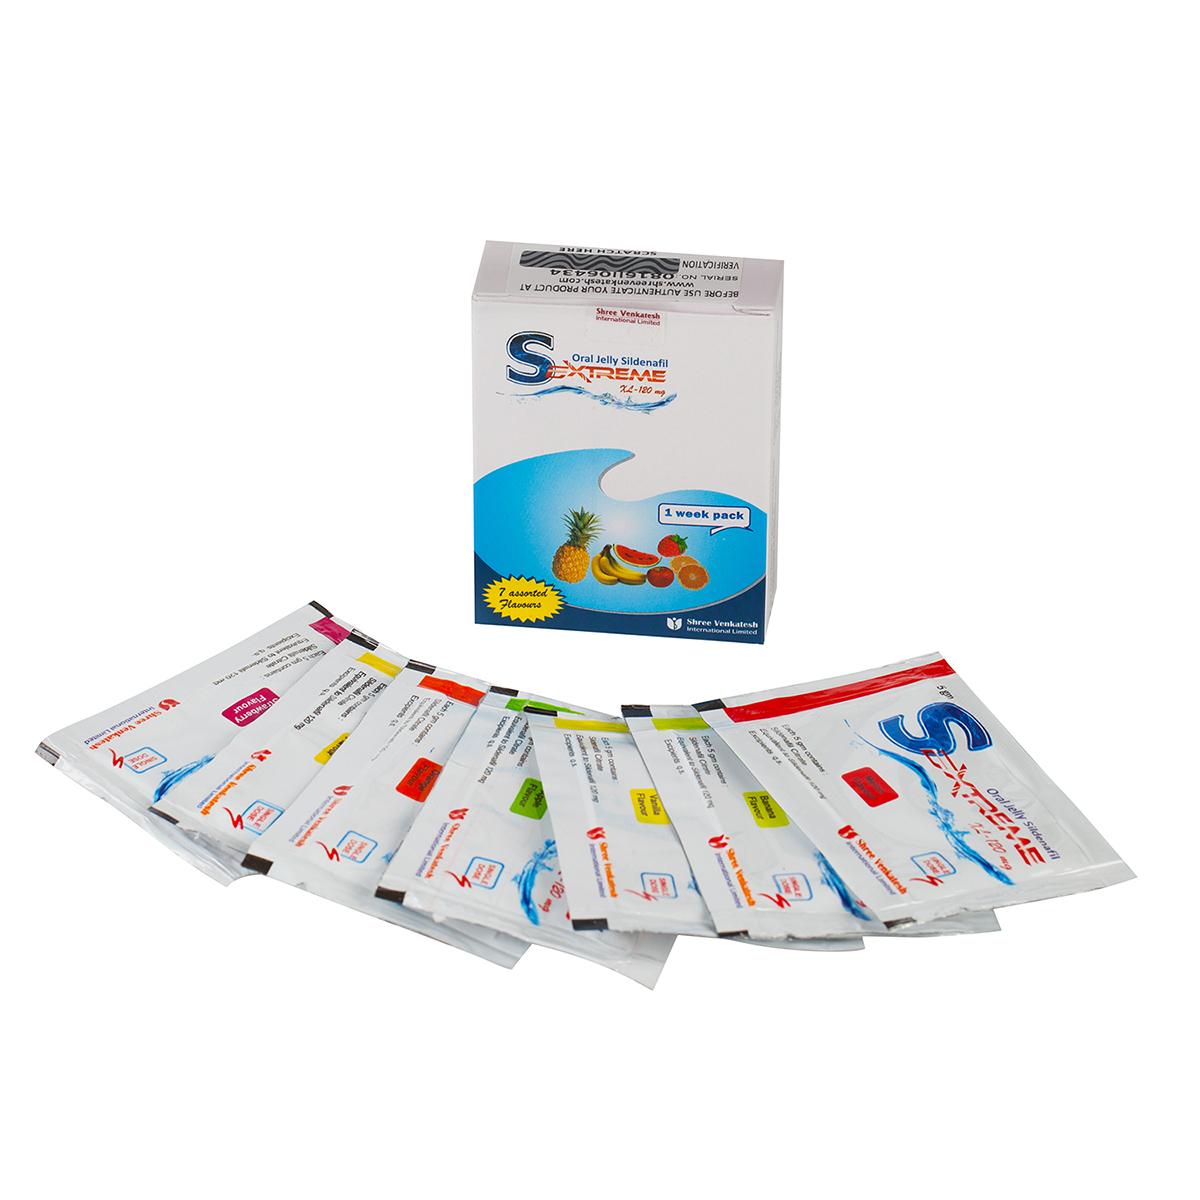 Sextreme Oral Jelly XL / Желета за мощна ерекция (Sildenafil Citrate – 120 mg.) – 7 пакета